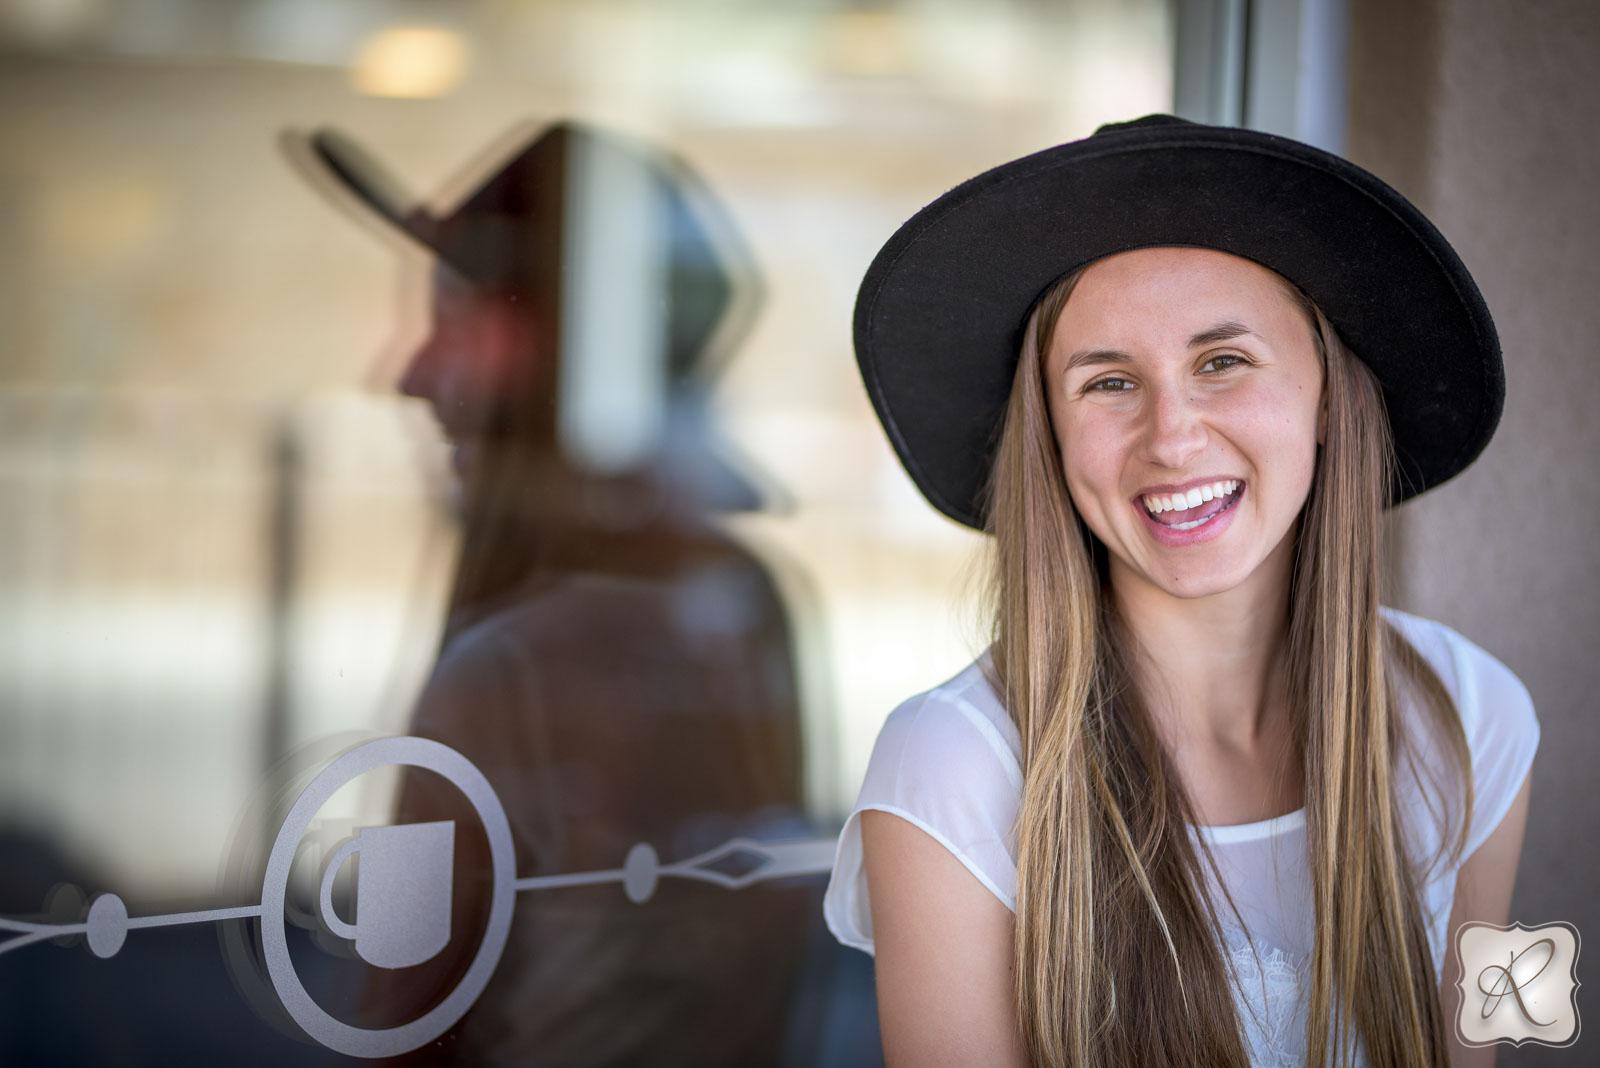 professional senior pictures by Allison Ragsdale in Durango, Colorado